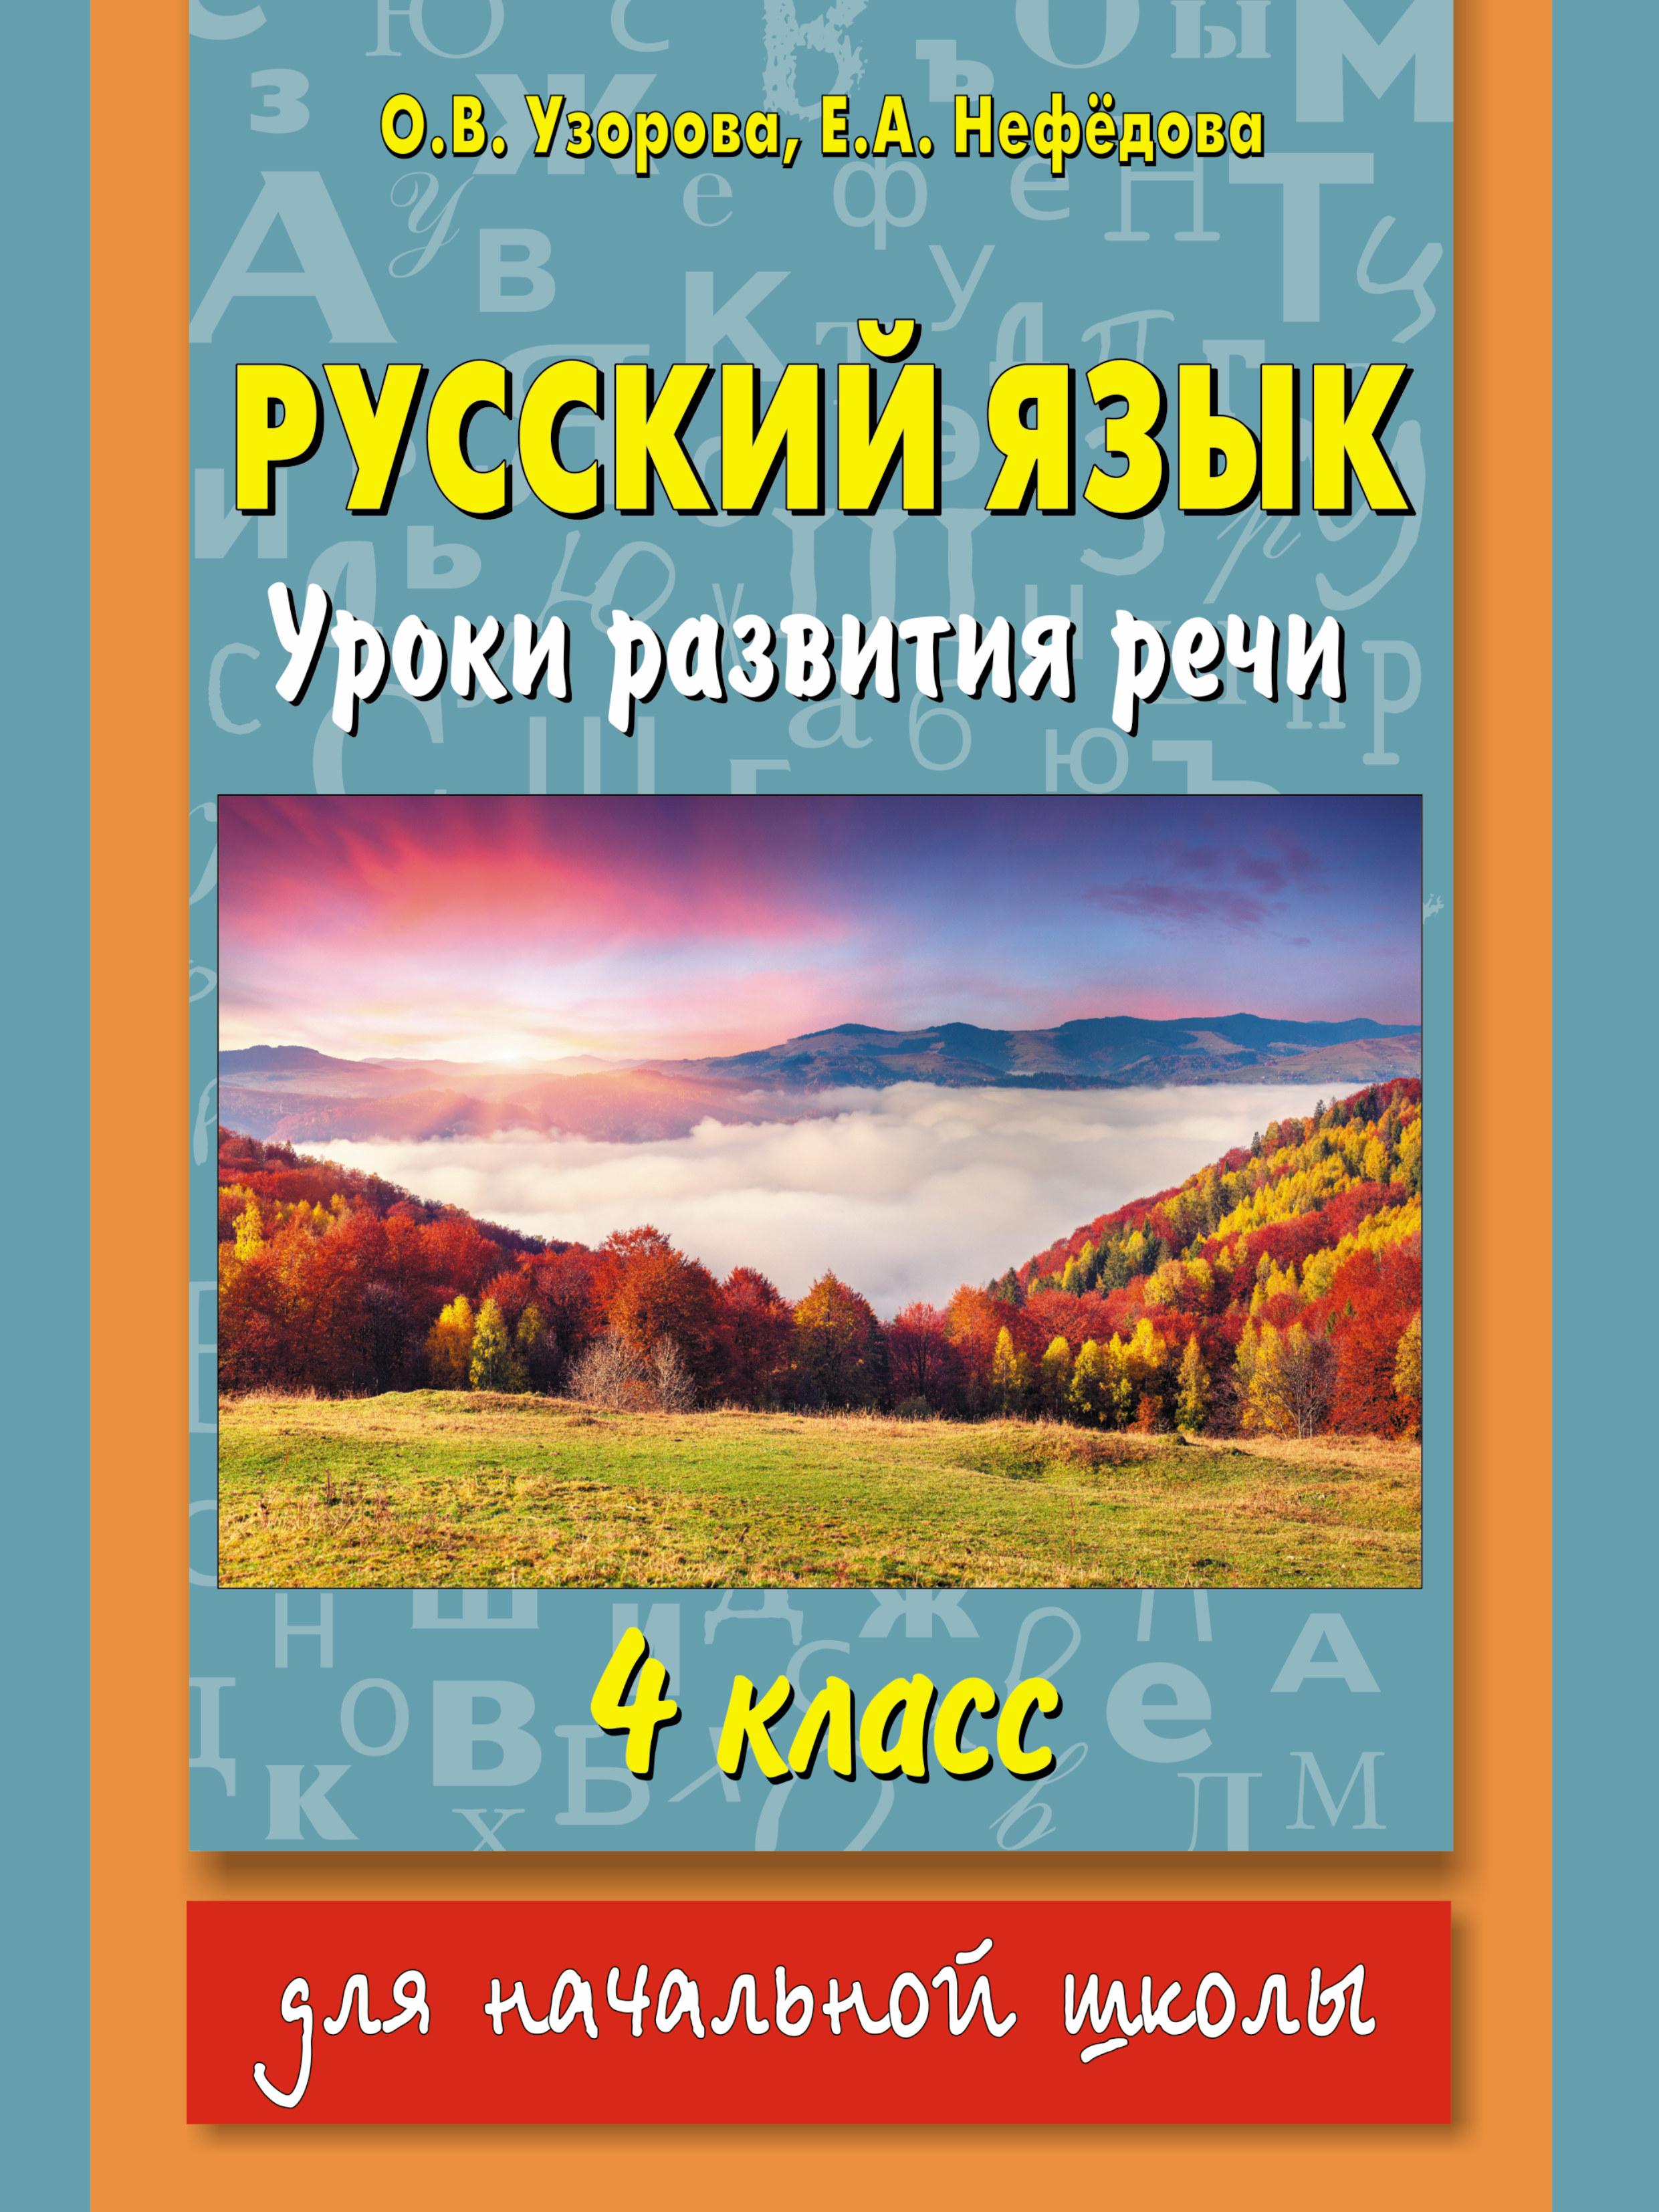 О. В. Узорова, Е. А. Нефедова. Русский язык. Уроки развития речи. 4 класс